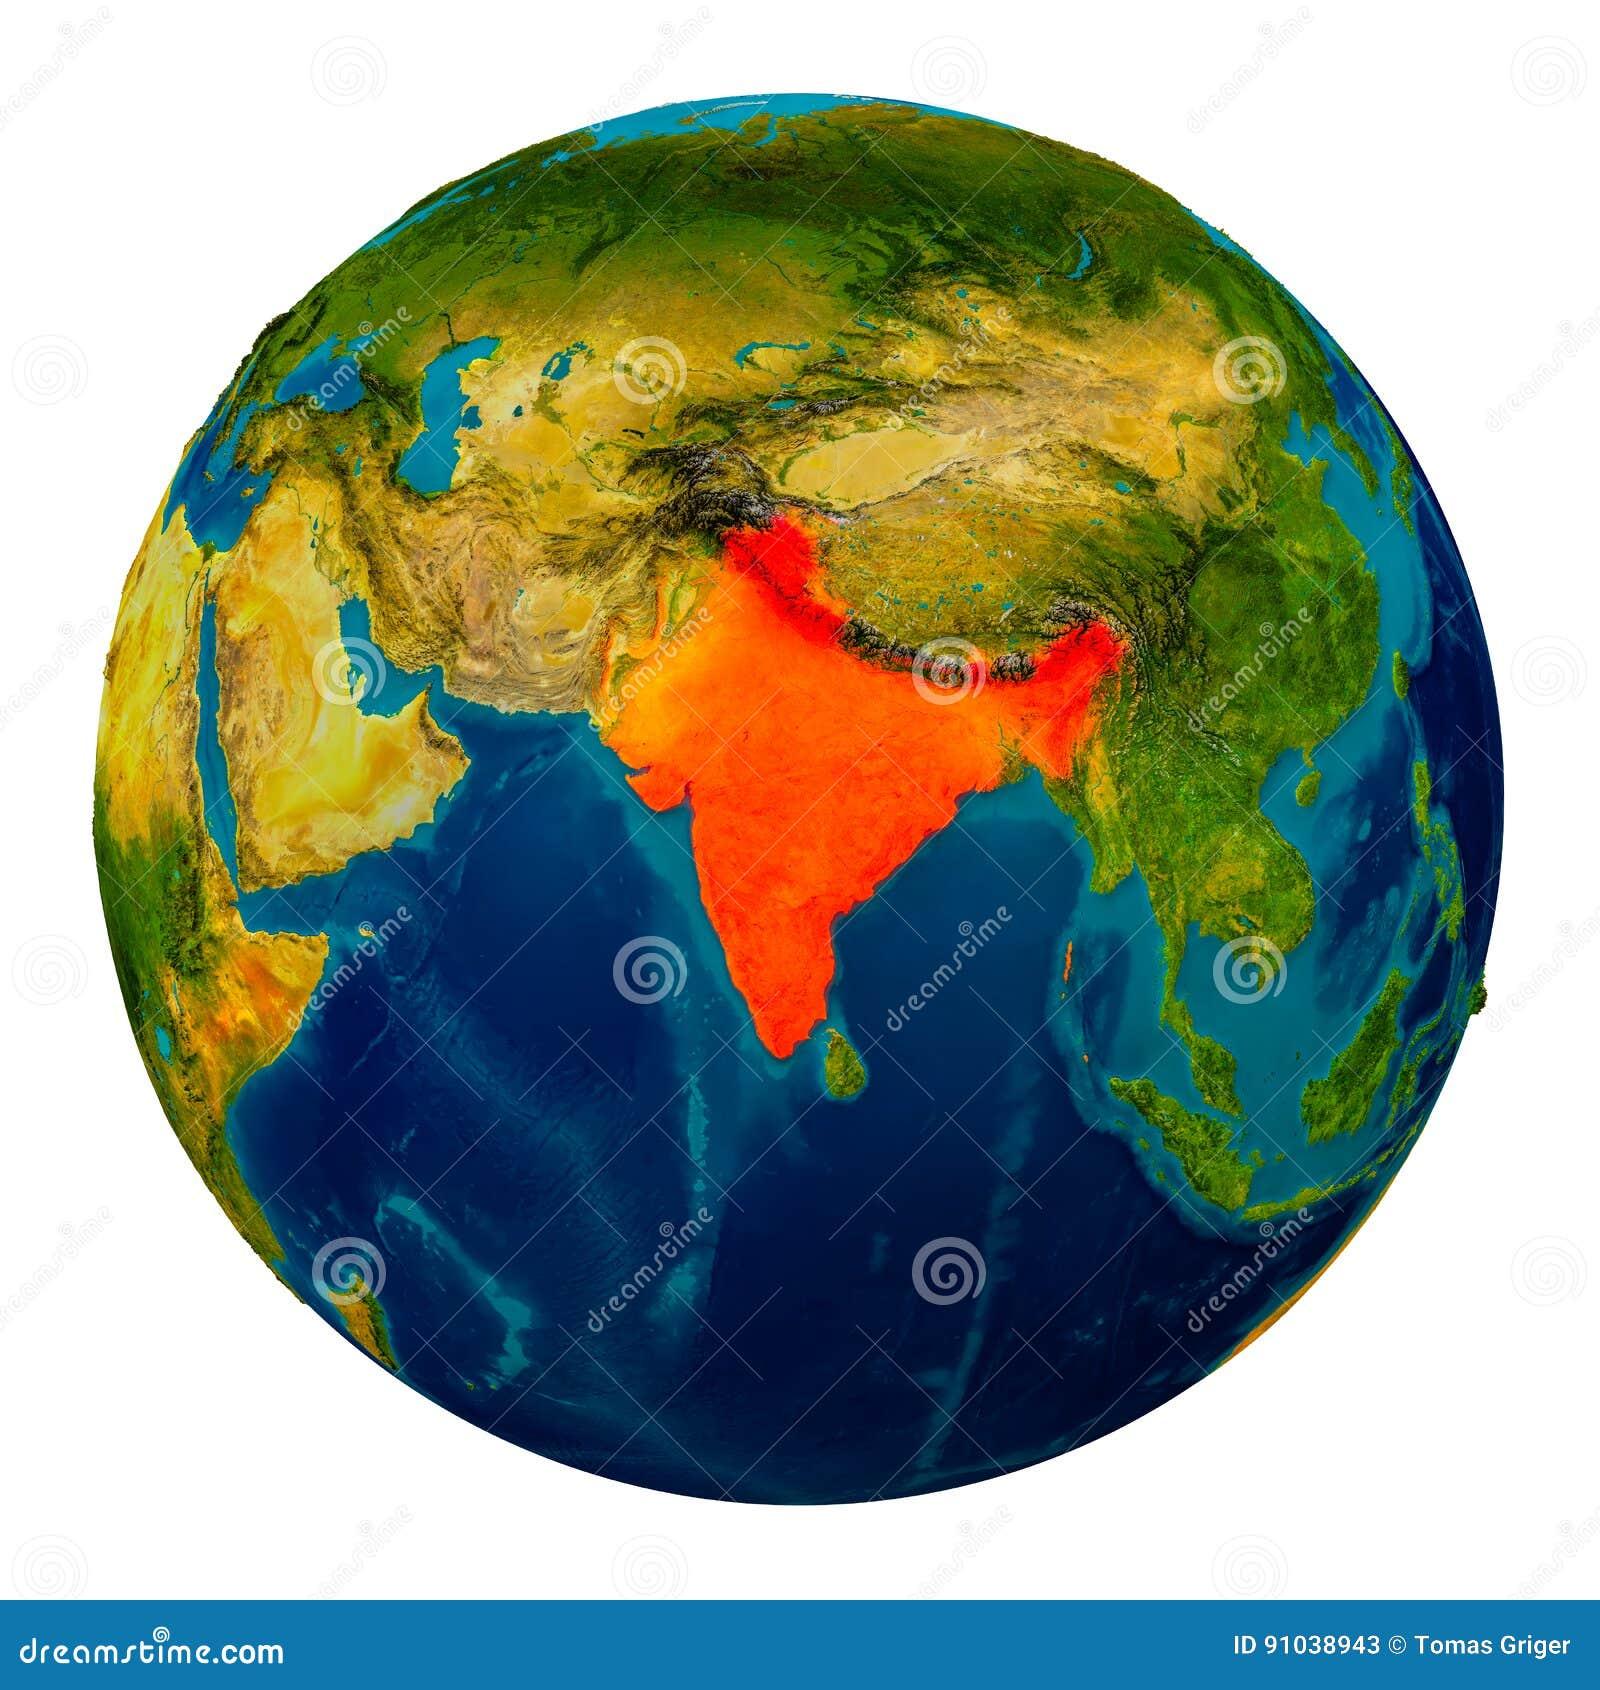 India highlighted on globe stock illustration. Illustration of orbit on pitchers from india, top religions in india, world atlas, globe india, mountains in india, world continents india, world yoga day in india, digital technology in india, most beautiful places india, states of india, goa india, world maps before 1859, skype india, mumbai india, geography india, animals india, places in india, world from vietnam, kashmir india, people india,